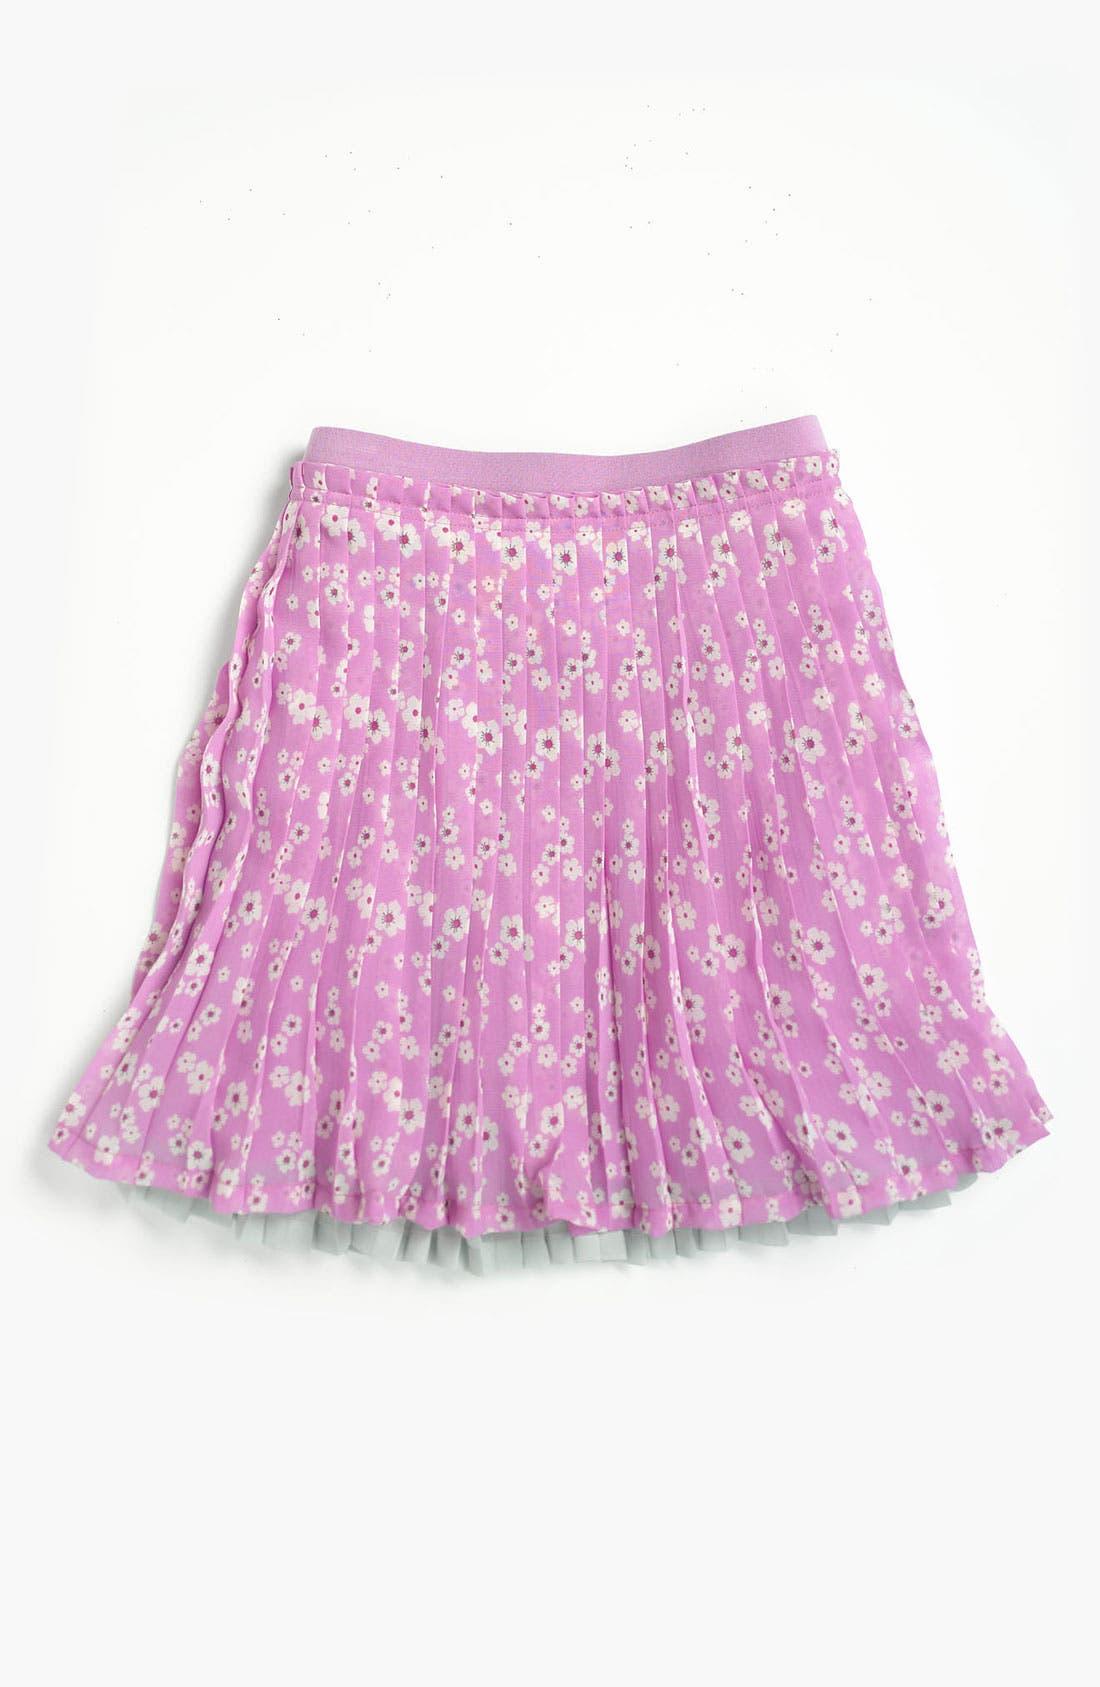 Alternate Image 1 Selected - Ruby & Bloom 'Chloé' Pleated Skirt (Big Girls)